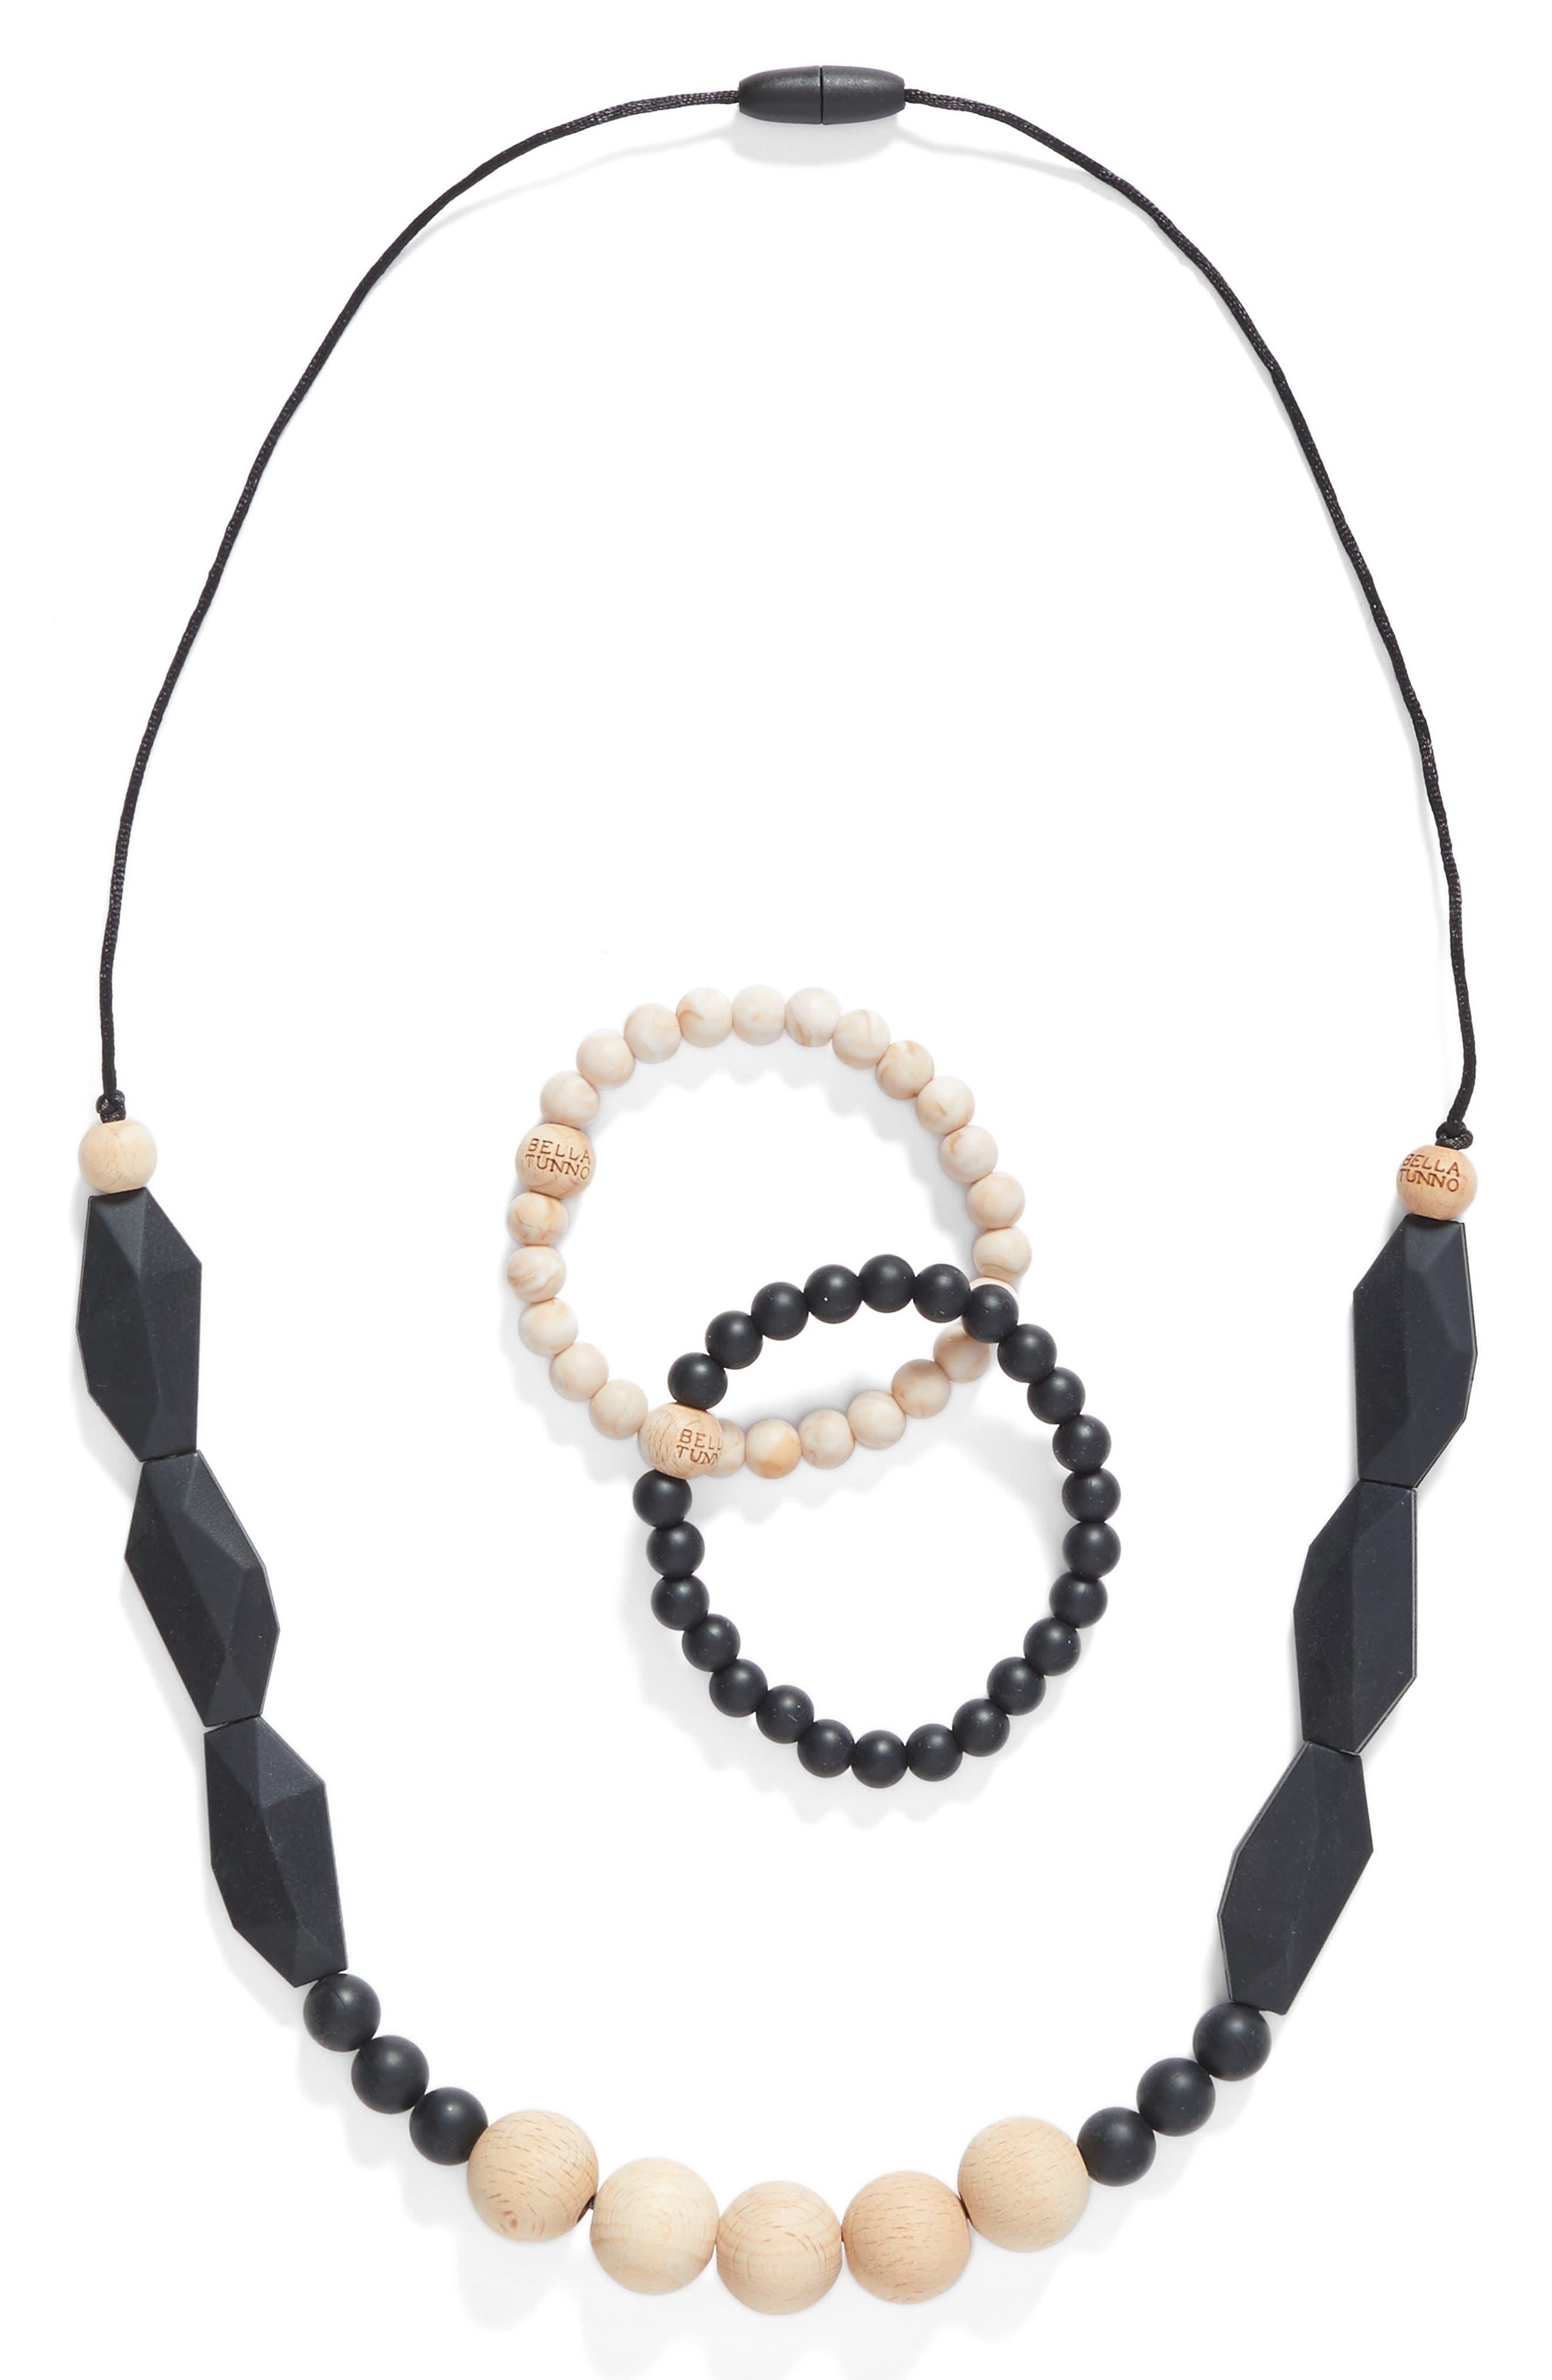 Main Image - Bella Tunno 3-Piece Teething Necklace & Bracelet Set